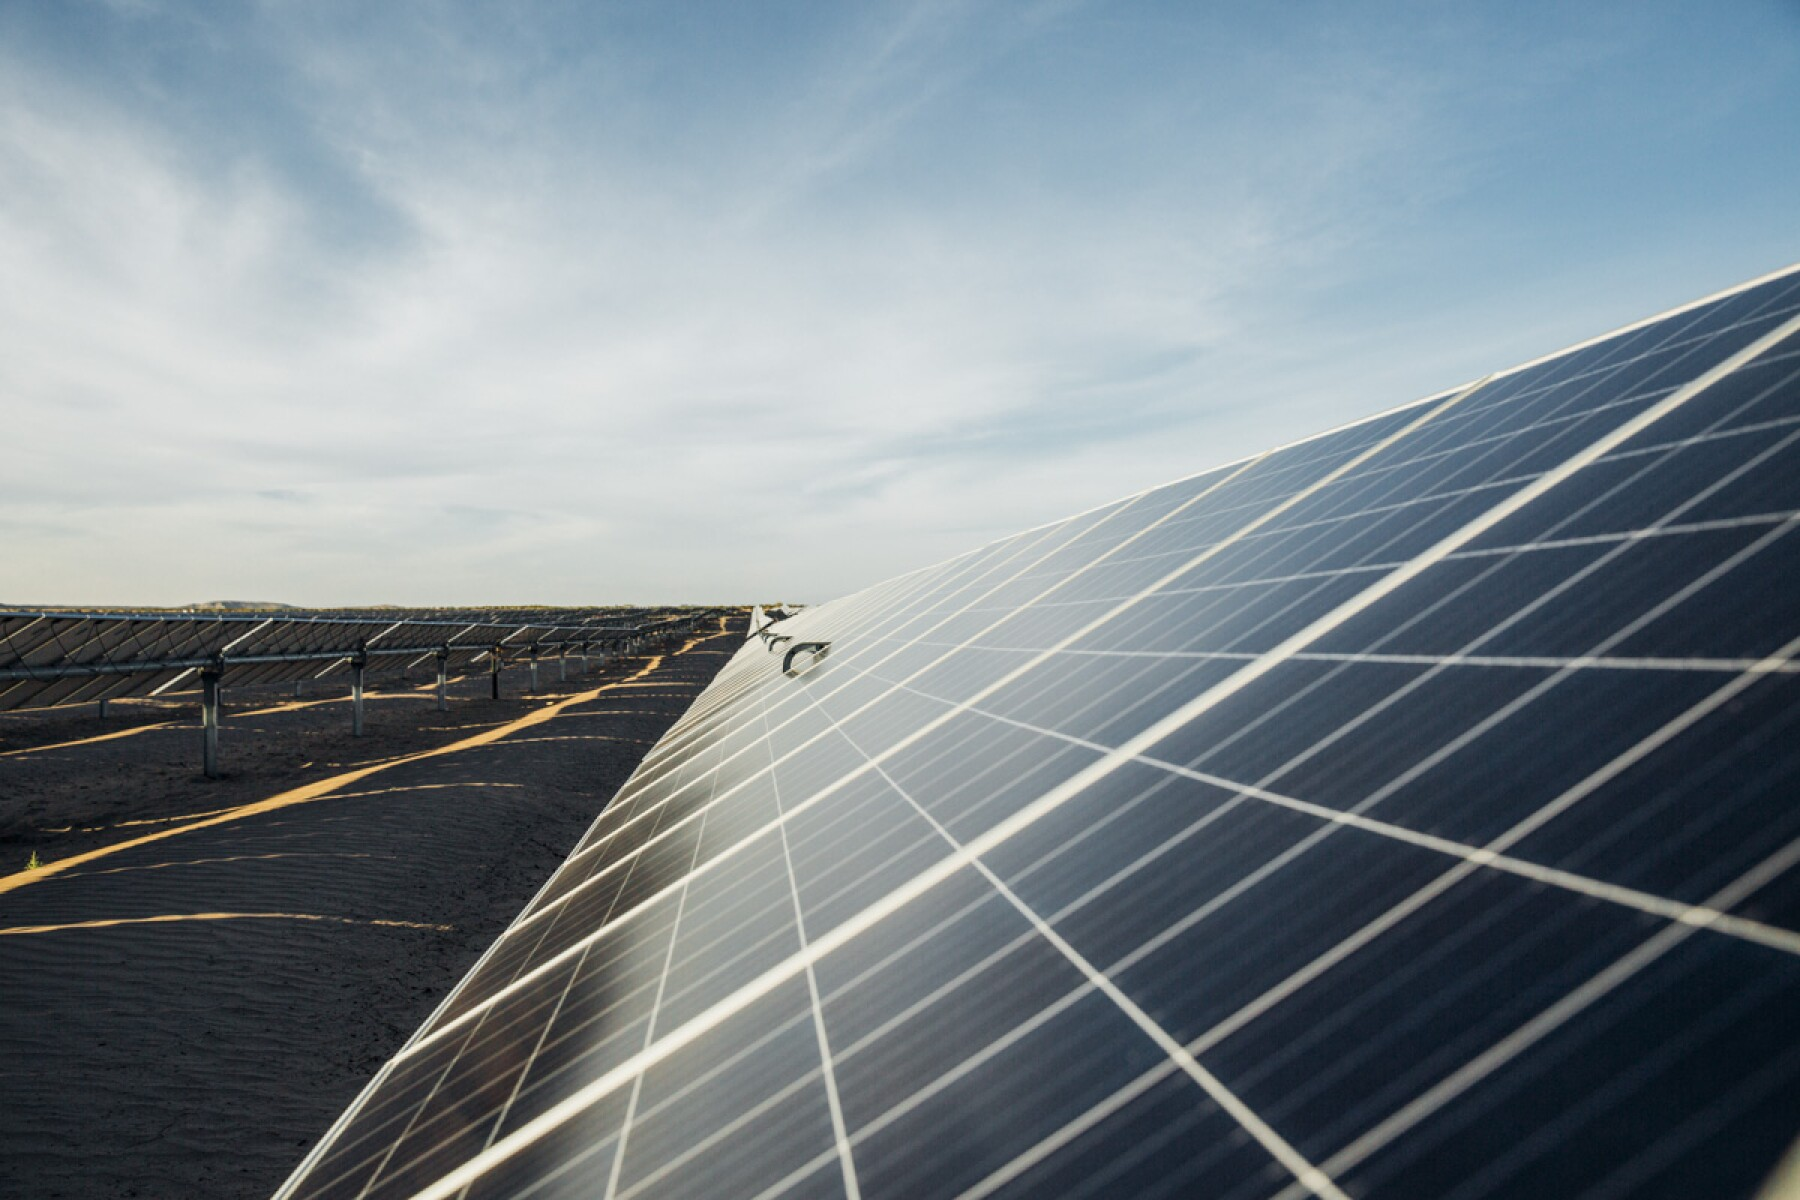 Proyectos fotovoltaicos - energías renovables